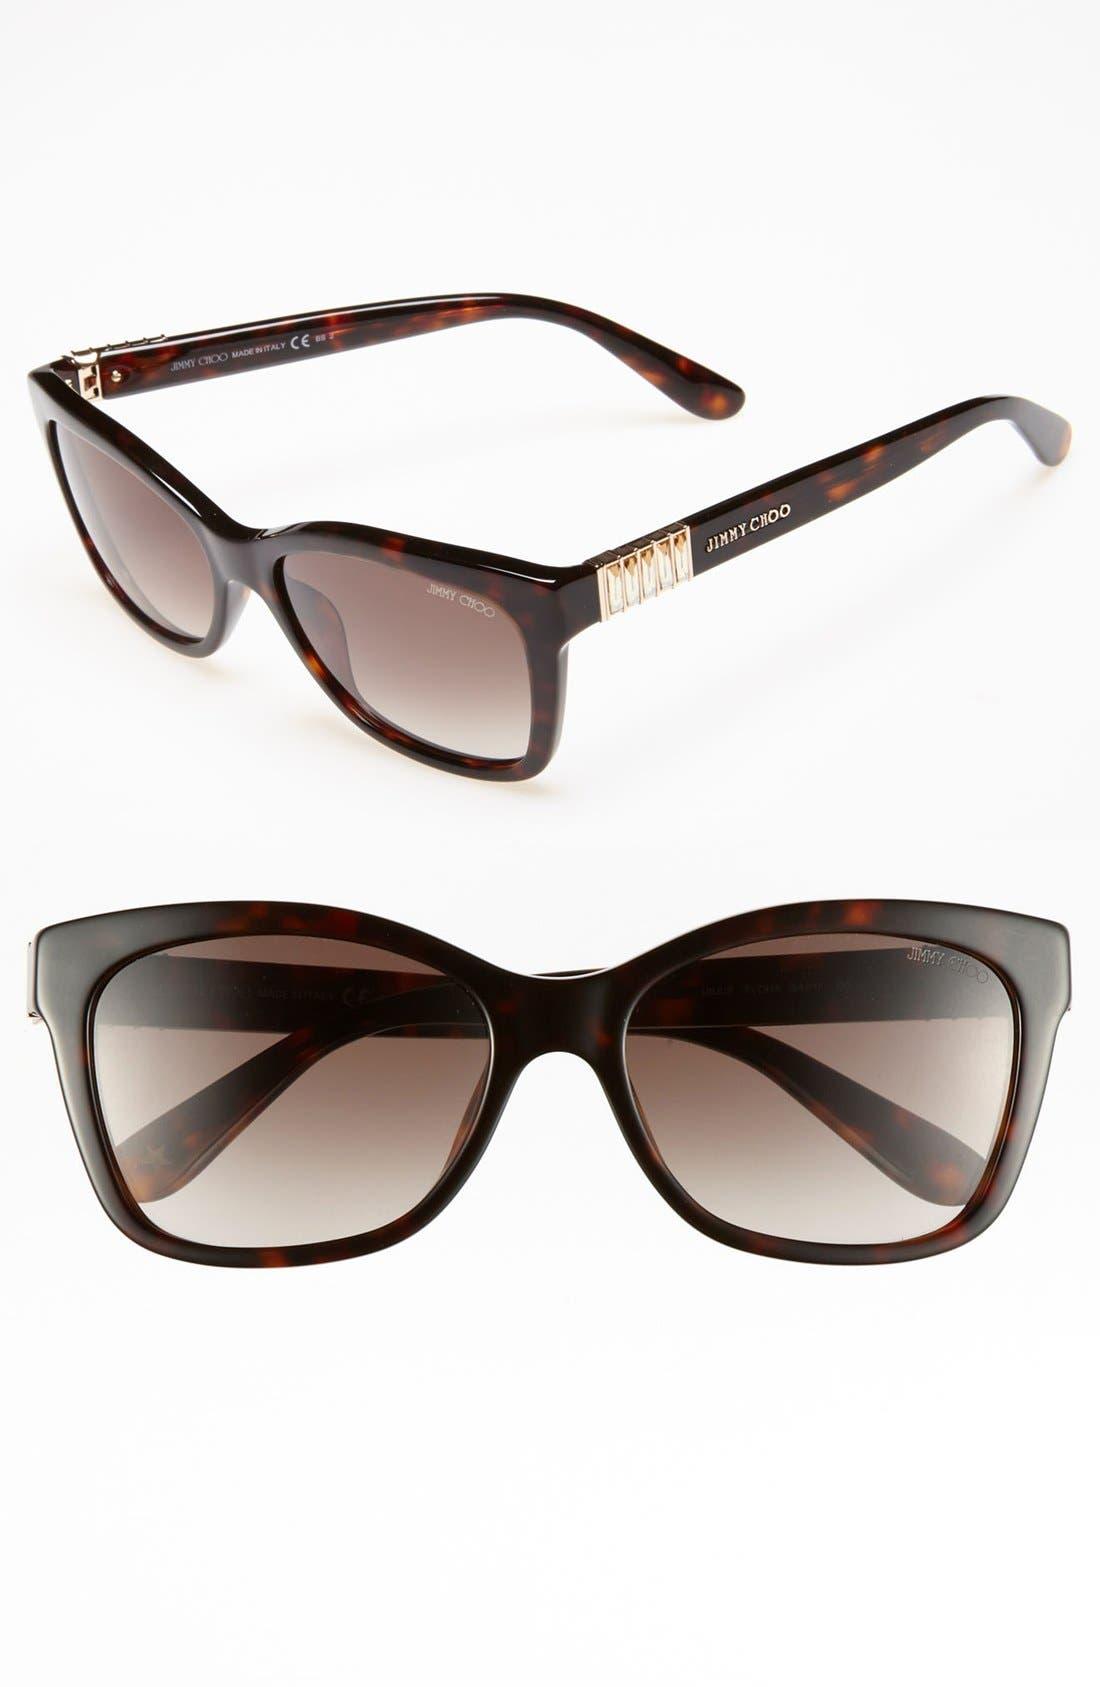 Main Image - Jimmy Choo 'Mimi' 54mm Sunglasses